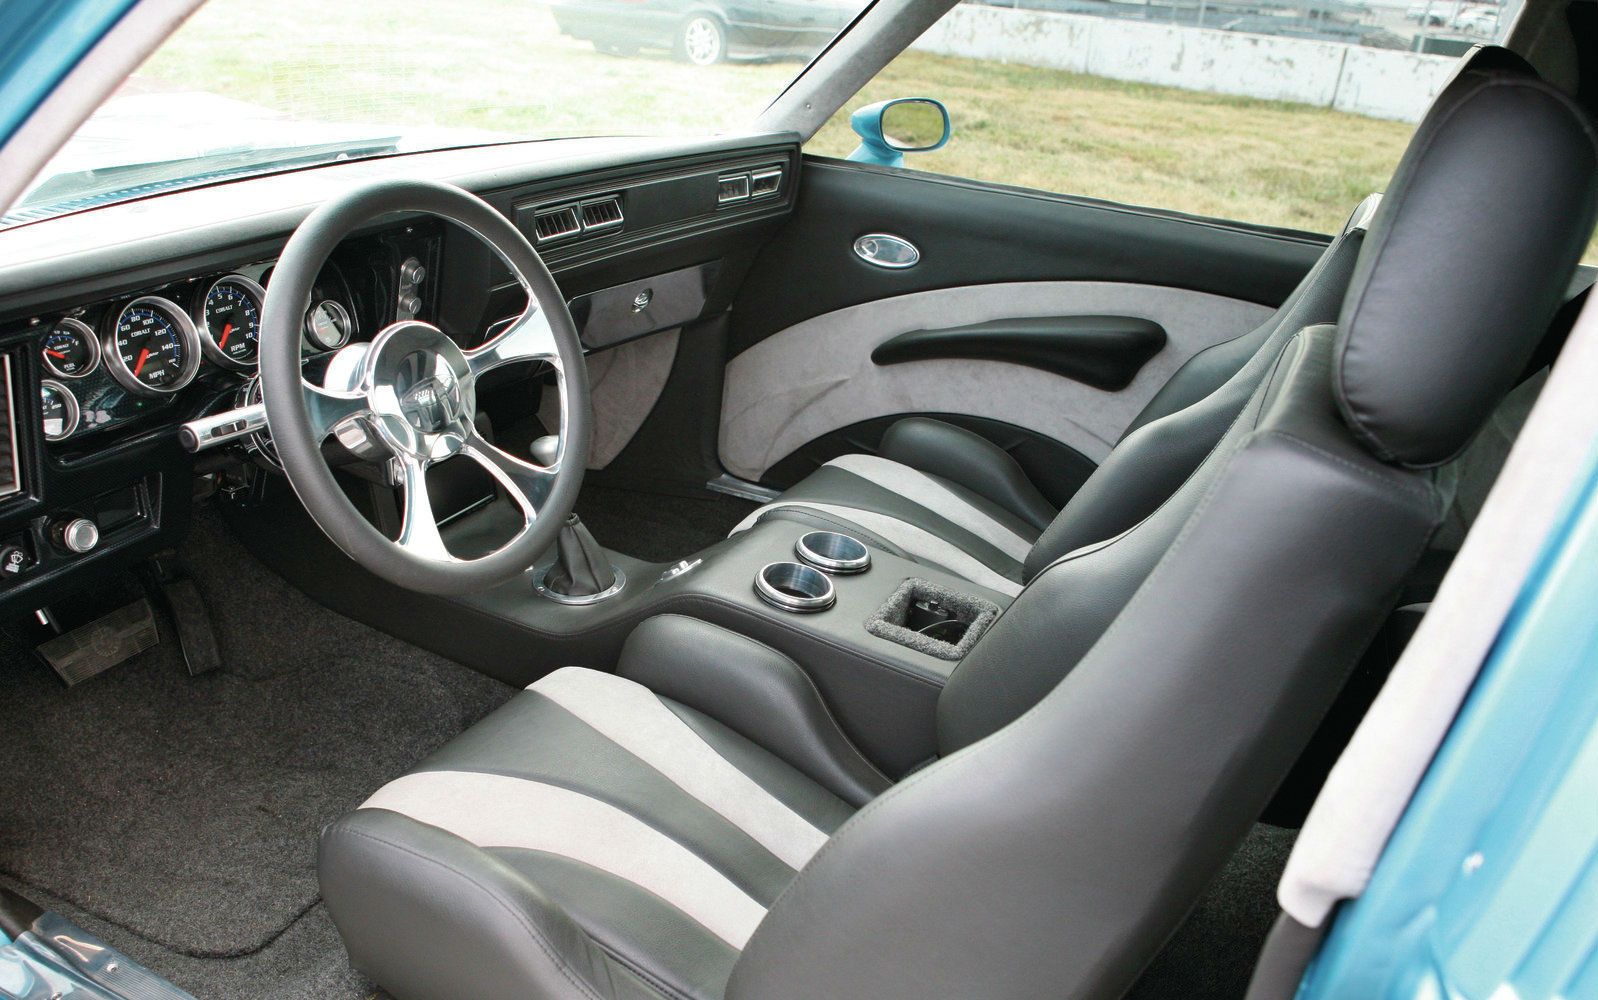 1977 Chevrolet Nova Interior Muscle Cars Zone